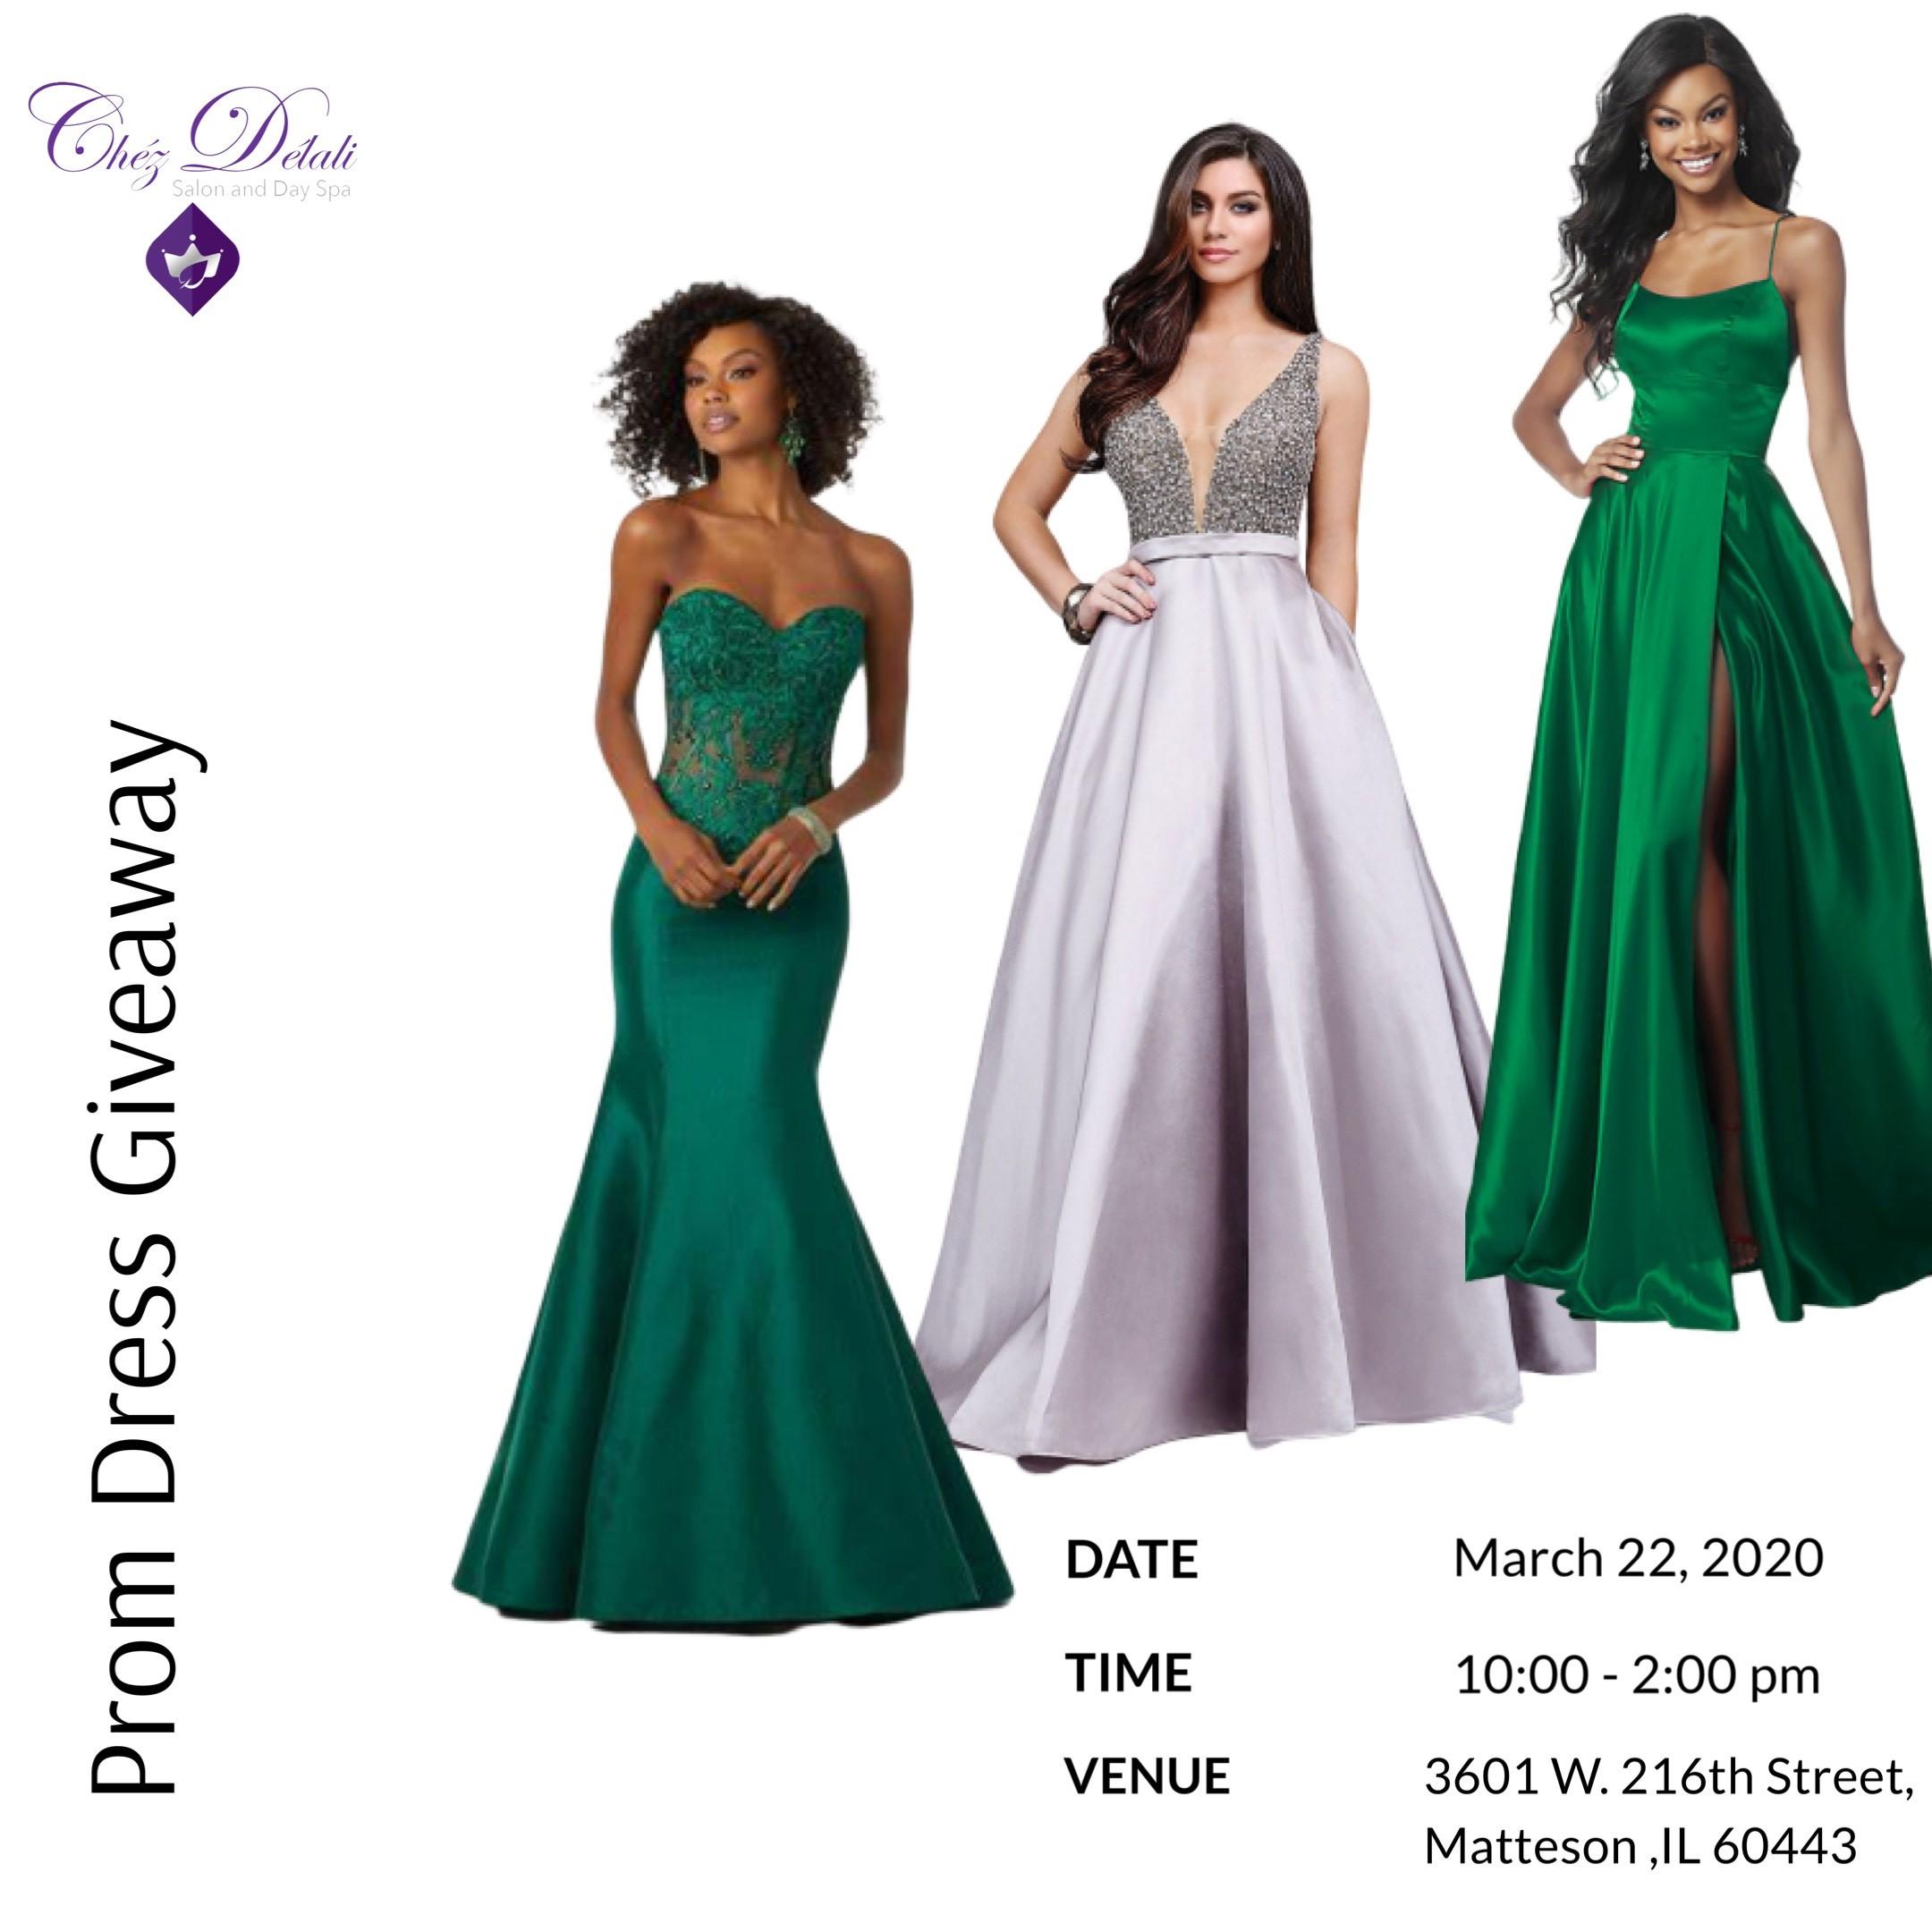 Chéz Délali Salon Prom Dress Giveaway Tickets, Sun, Mar 22